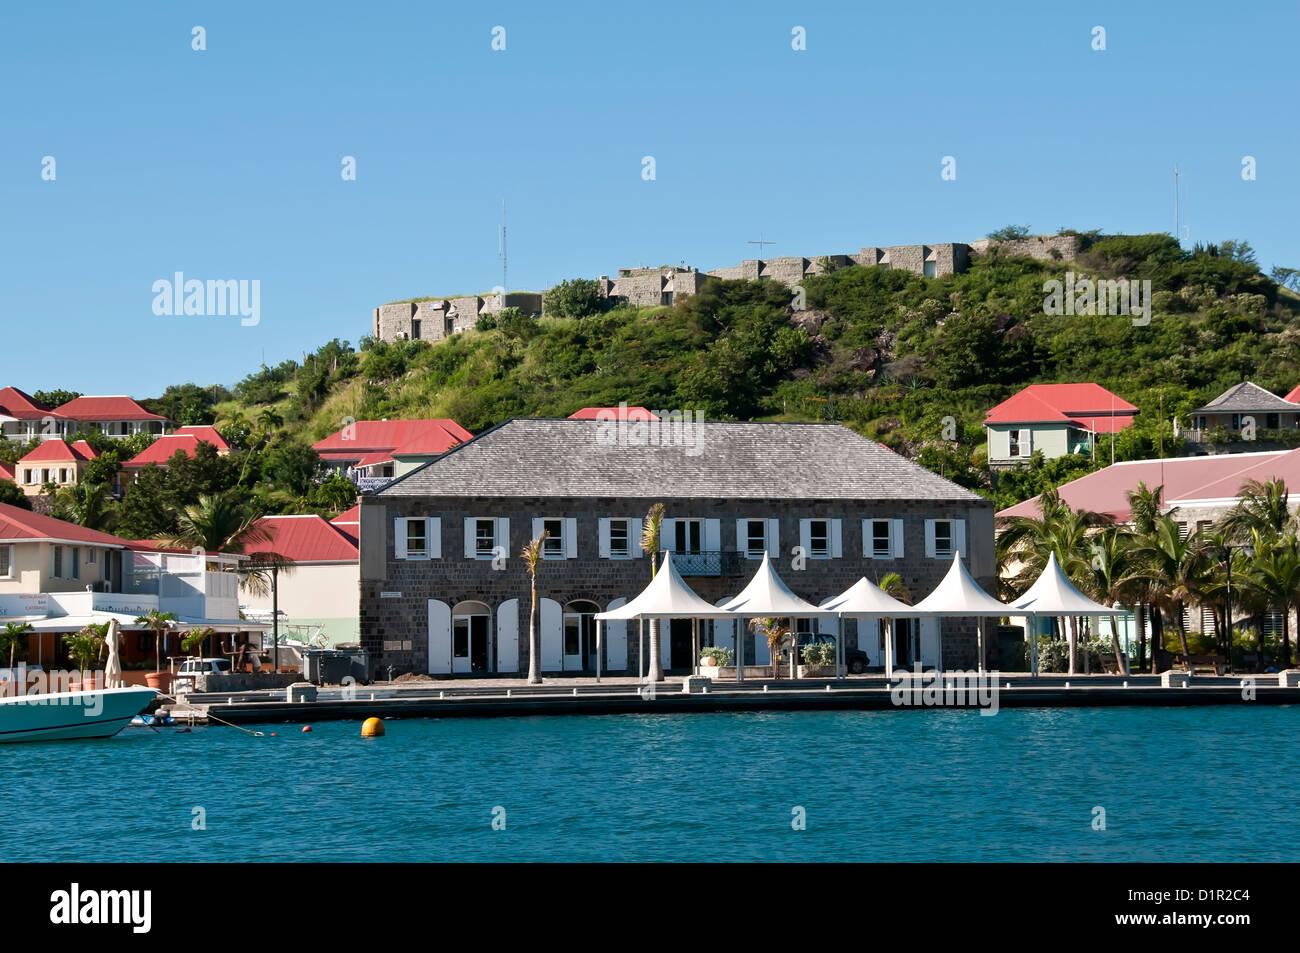 Stadtmuseum oder Wall House unter Fort Oscar, an der Spitze der Halbinsel Gustavia, Häuser die Gendarmerie. Stockbild